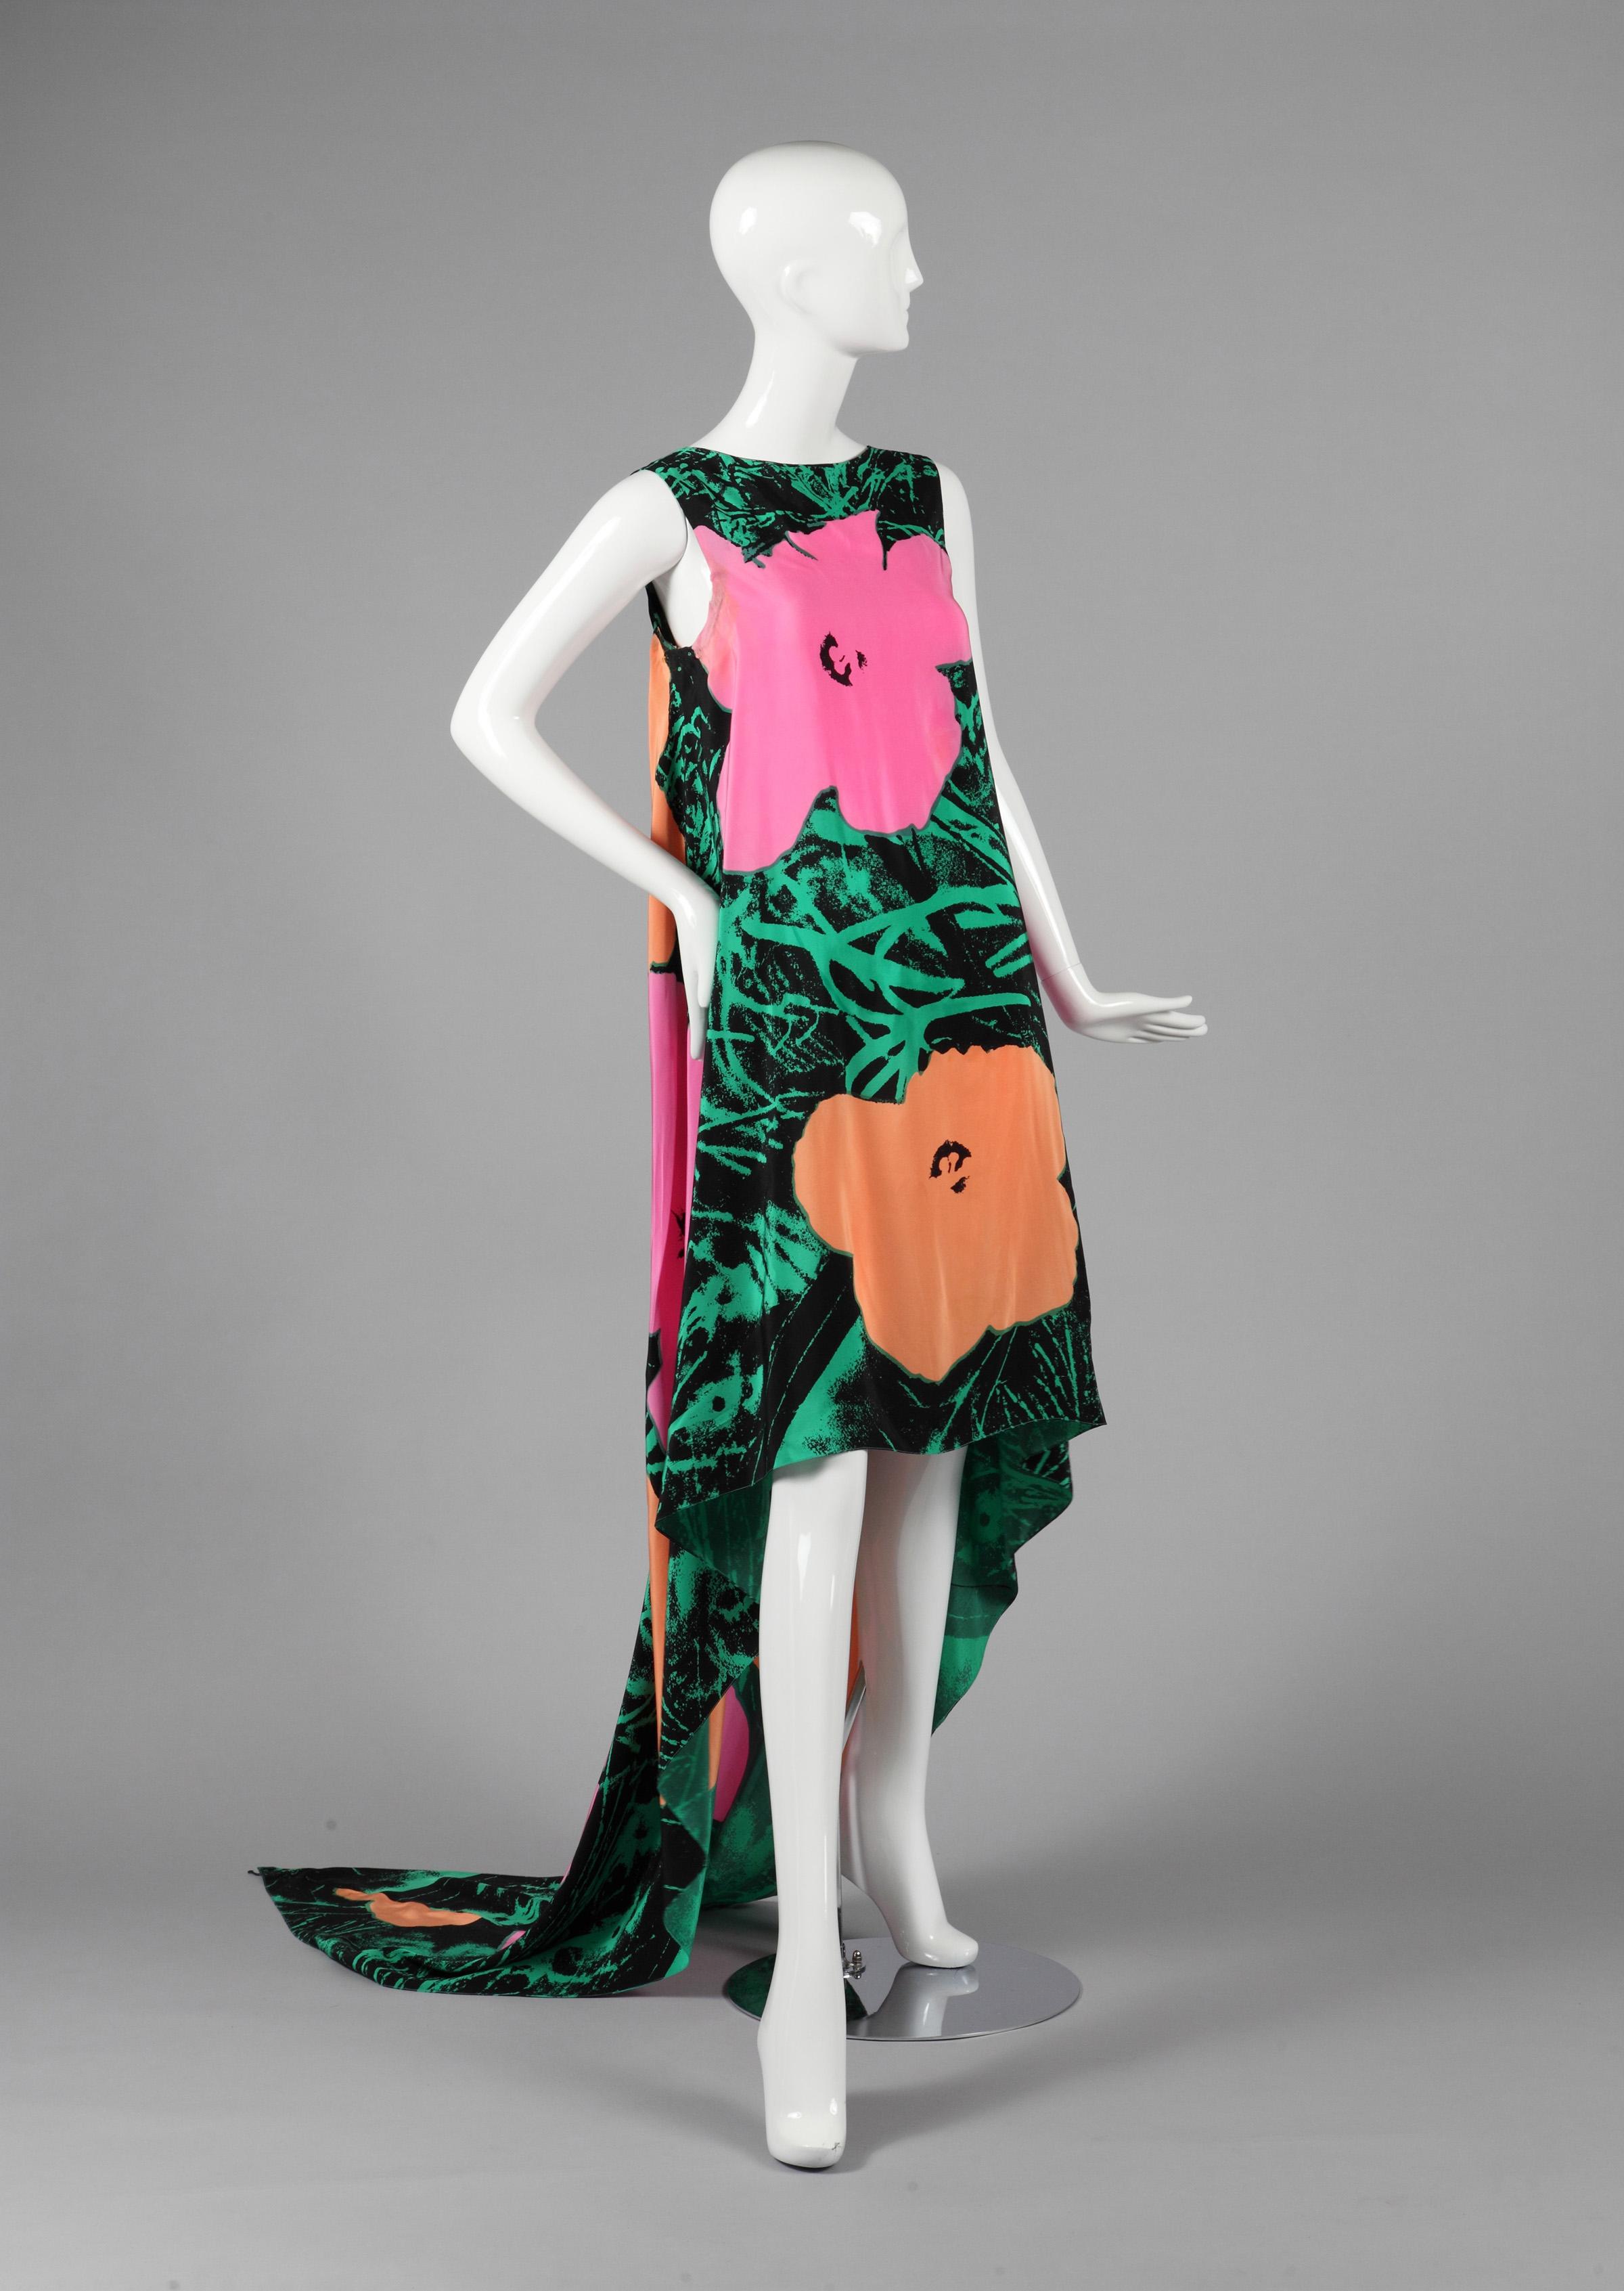 15_Halston_Evening_Dress_Flowers_Motif_Silk_knit_and_elastic_ca1972_Lesley_Frowick.JPG